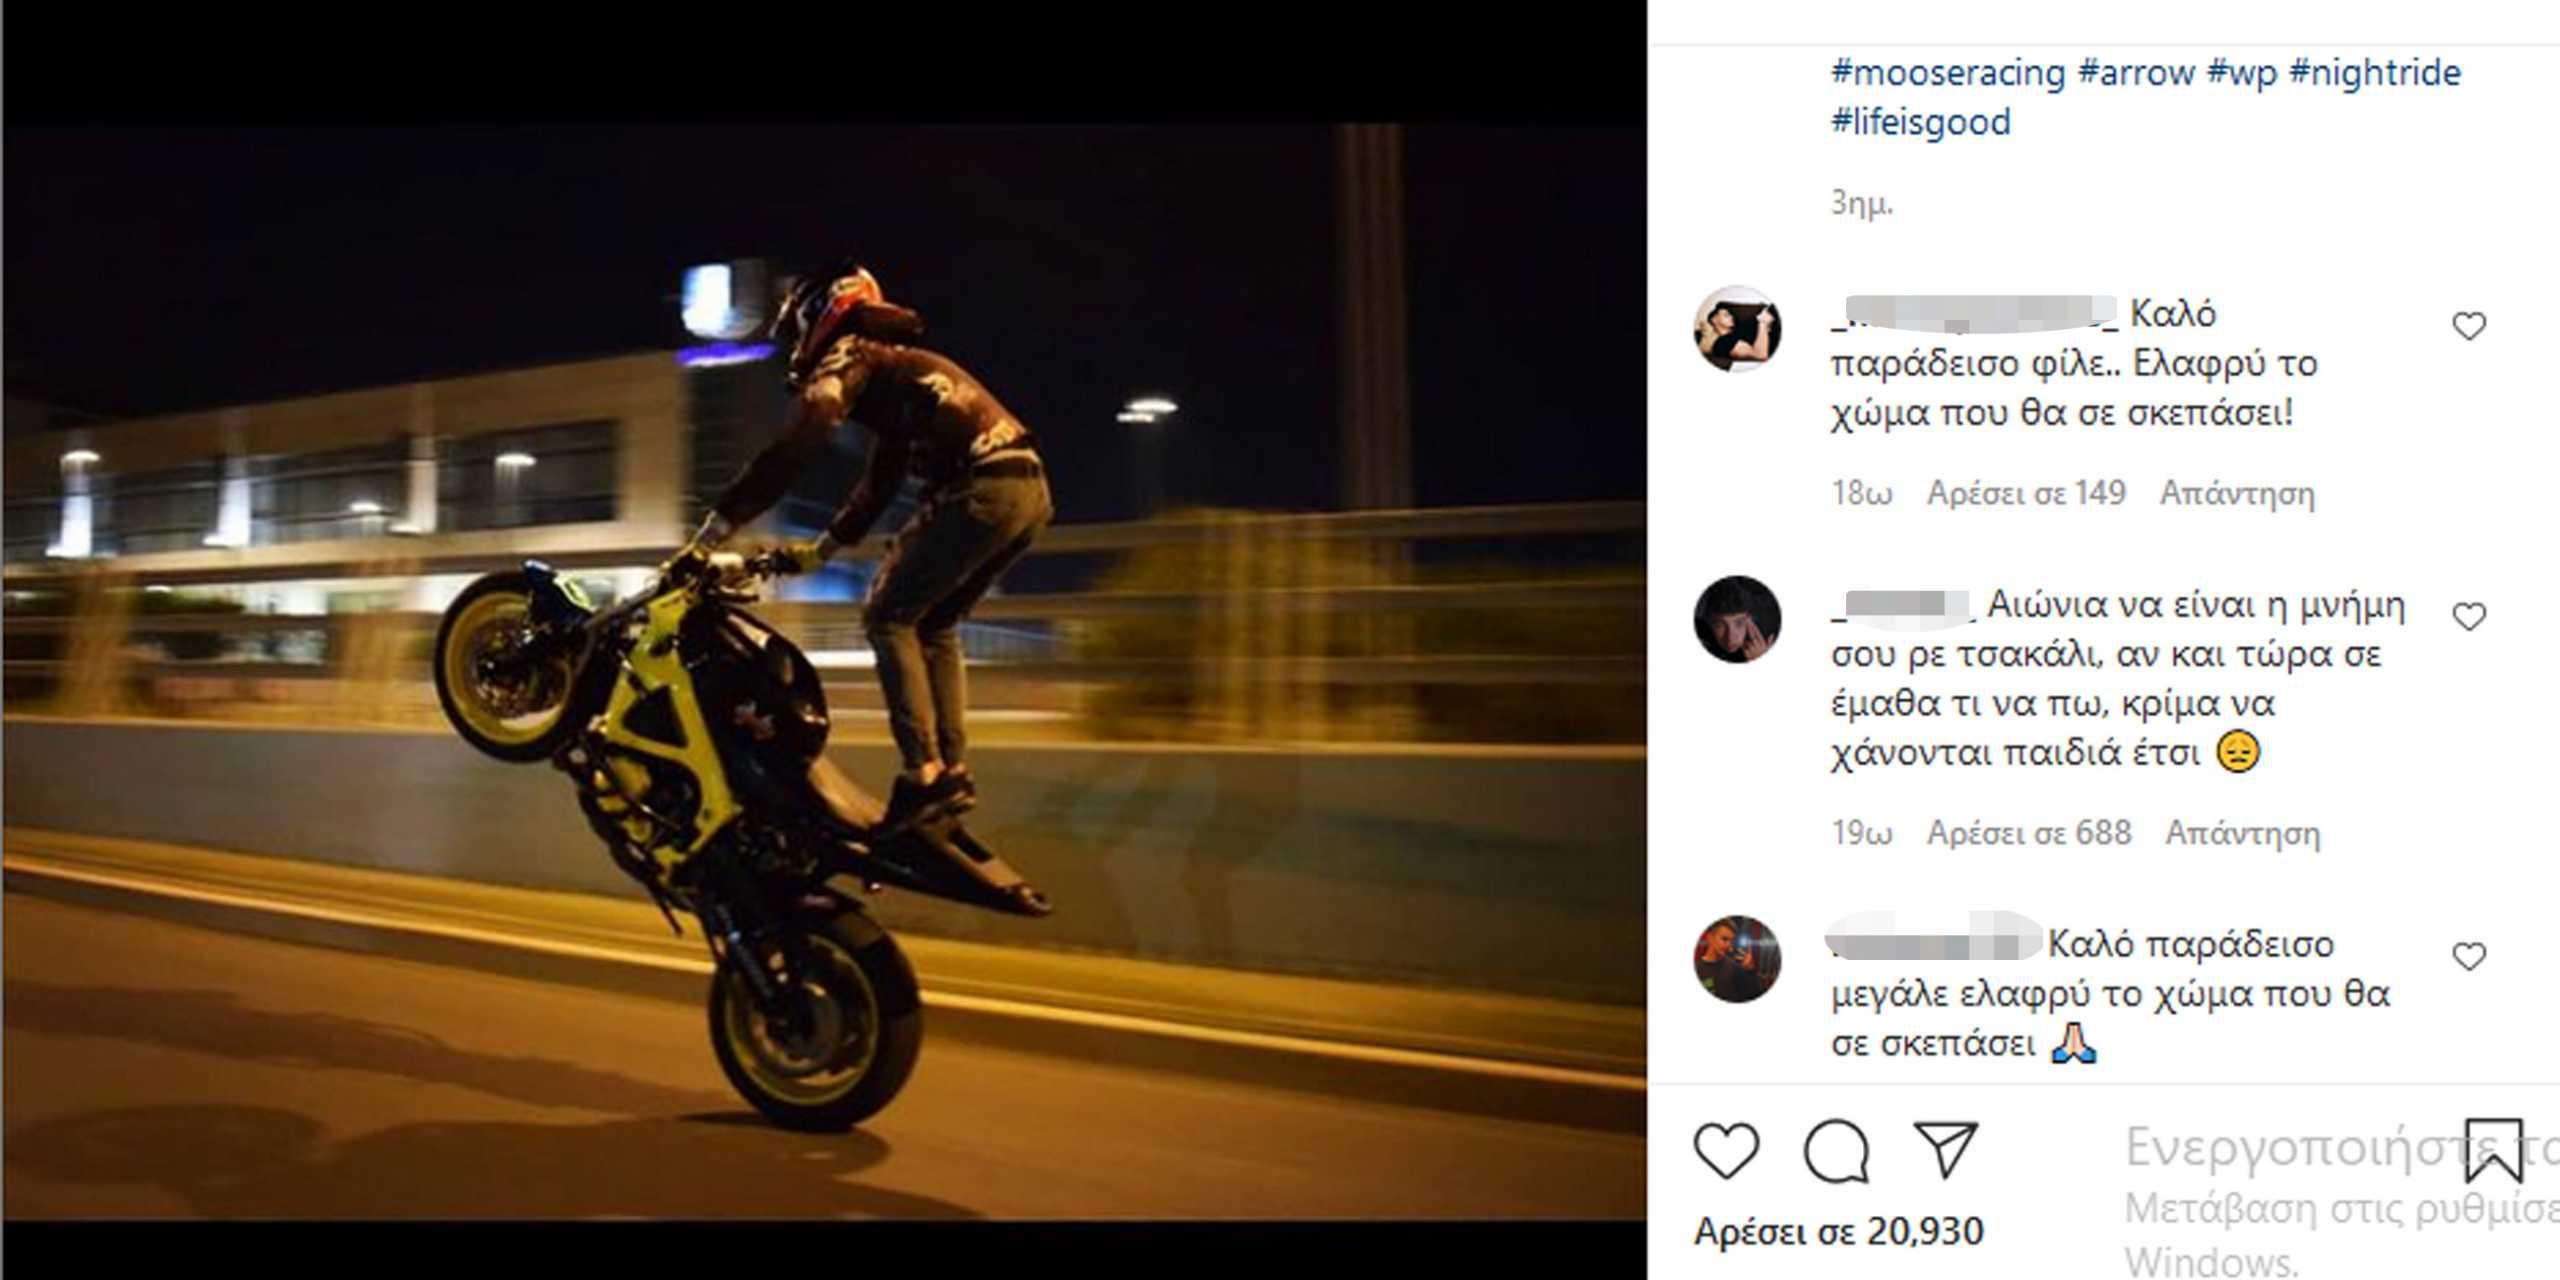 aigalew scaled - Νεκρός γνωστός youtuber και ο φίλος του σε τροχαίο με τις μοτοσυκλέτες τους